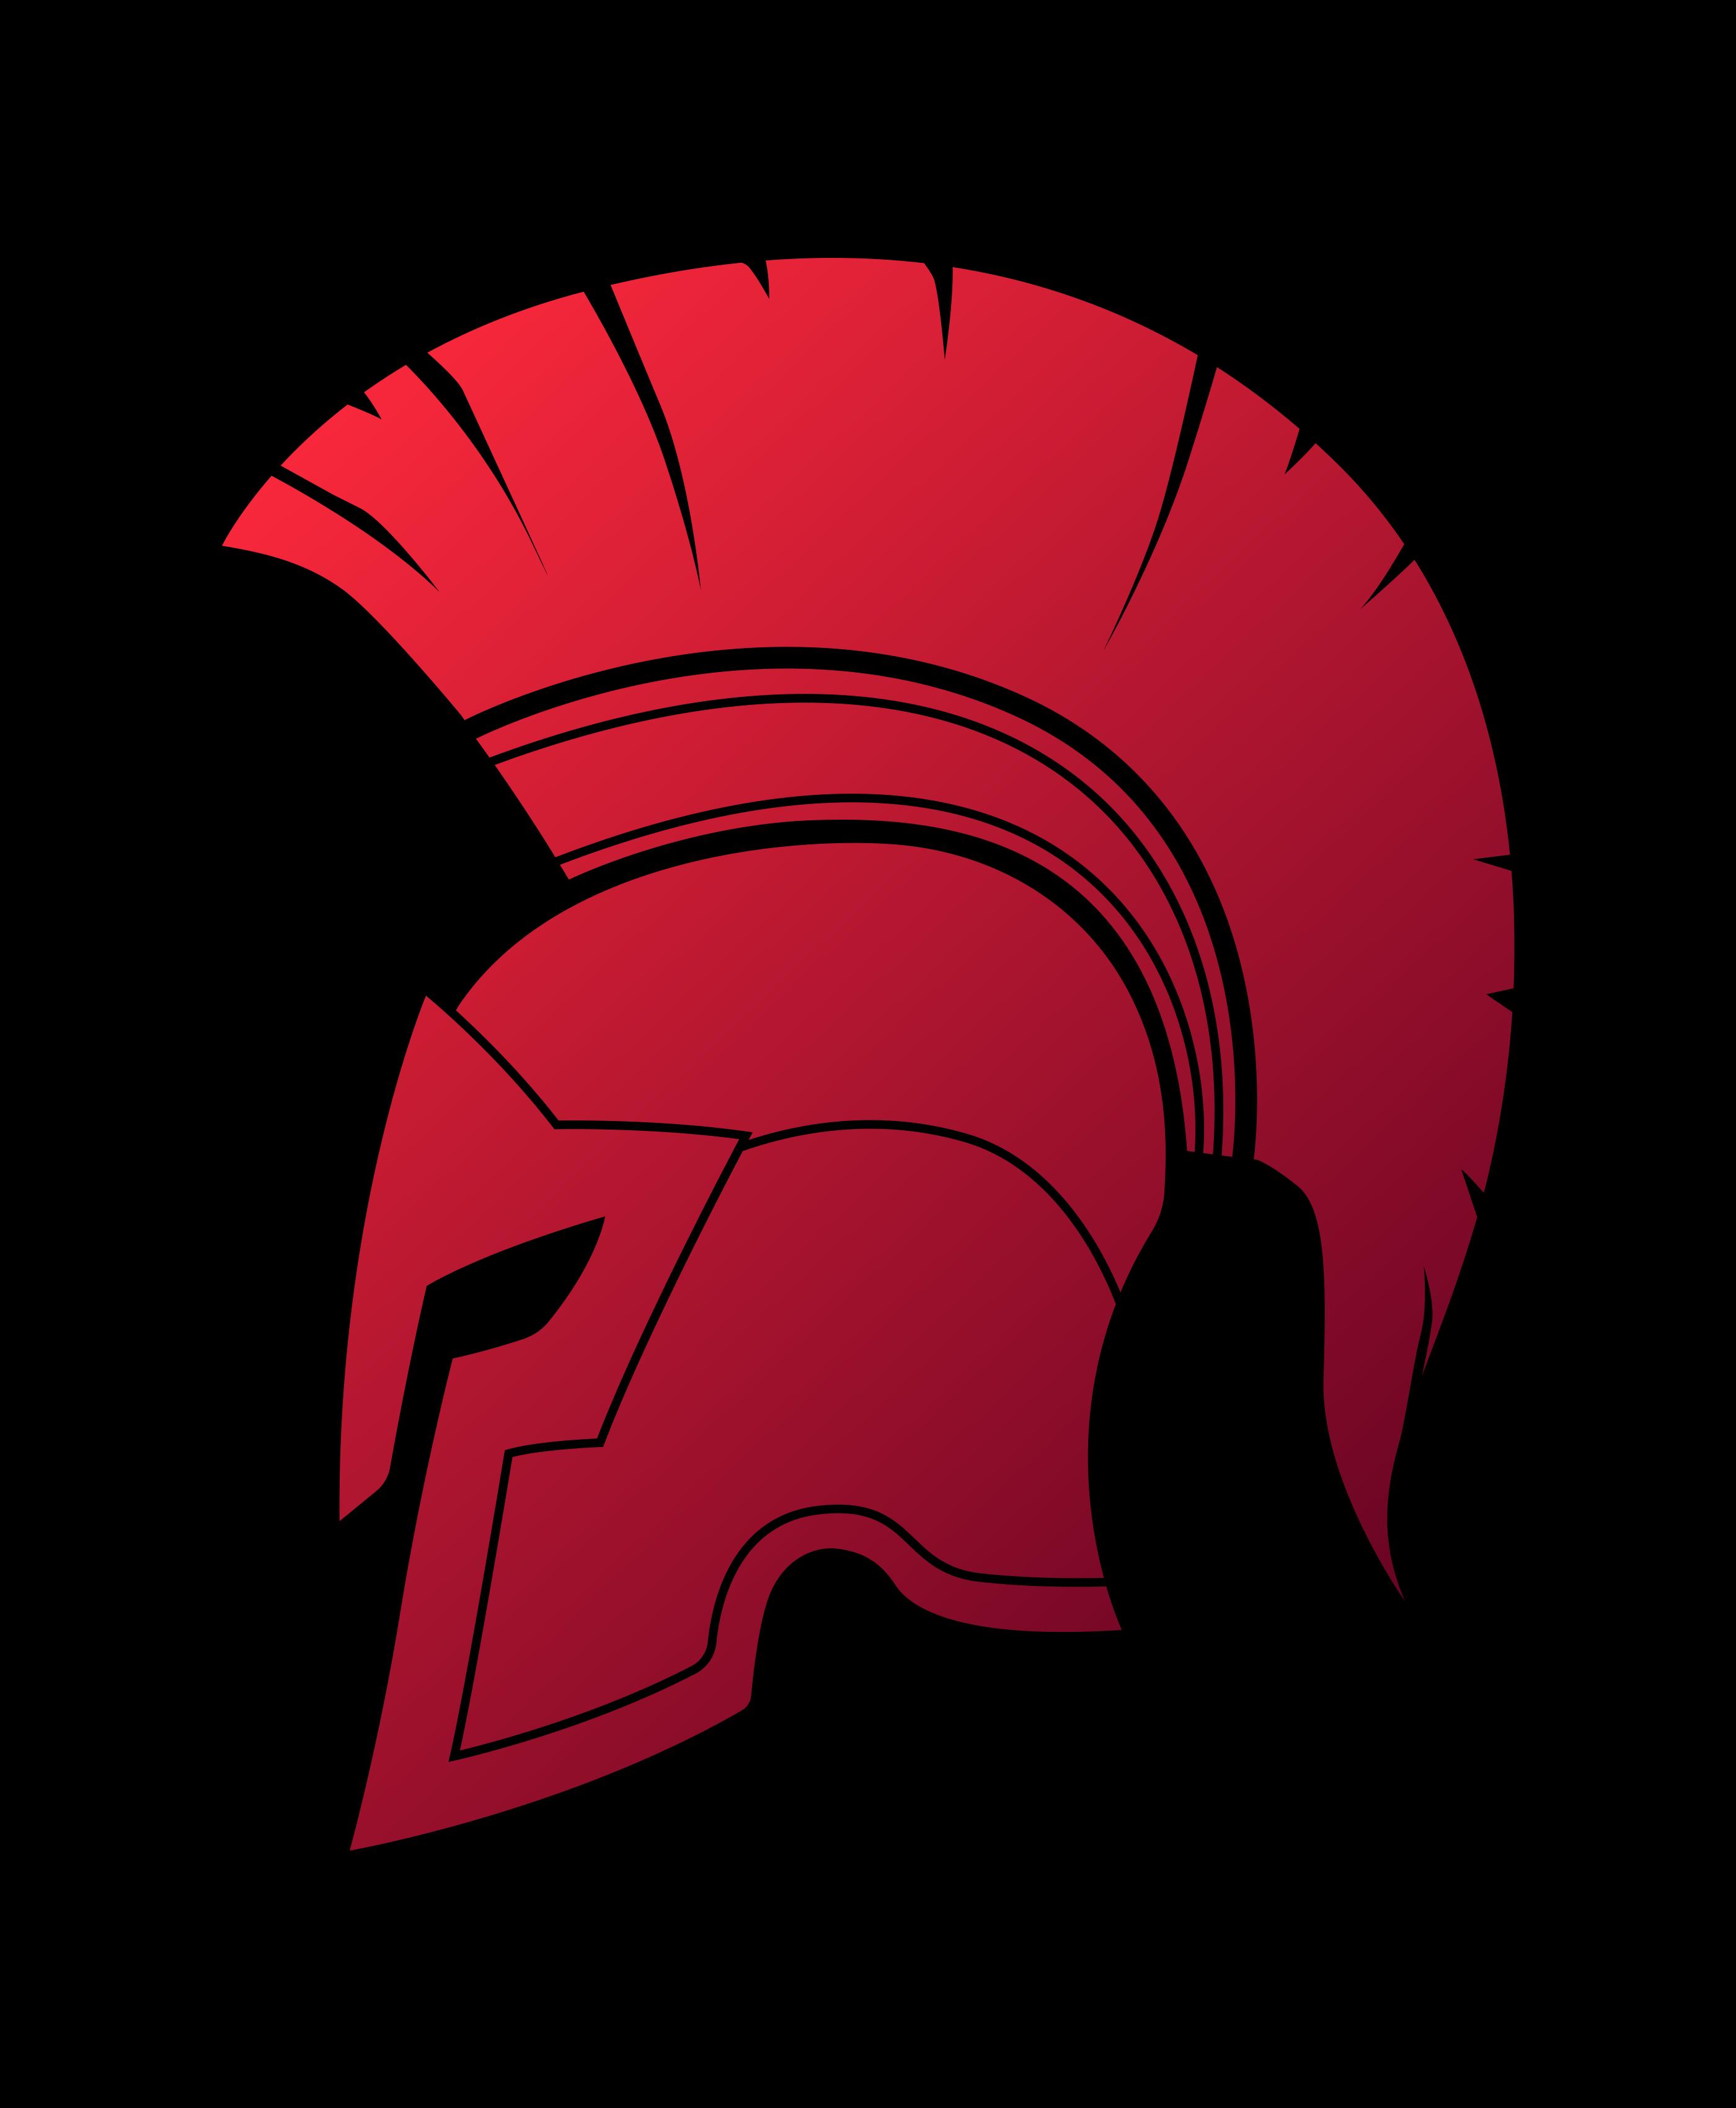 Spartan Helmet Red Spartan Helmet Spartan Typographic Logo Design